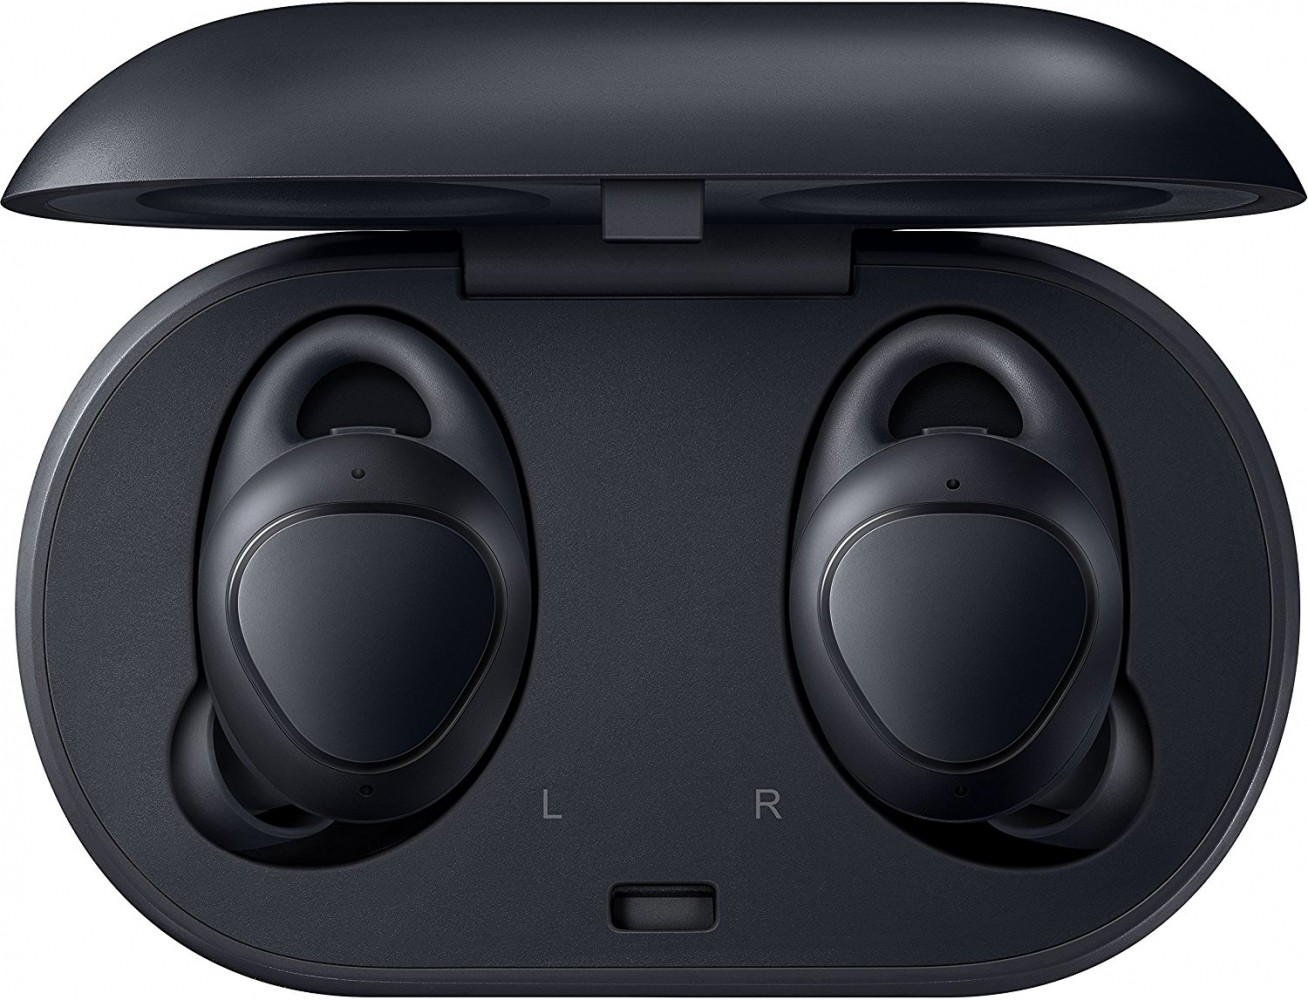 Samsung Gear IconX 2018